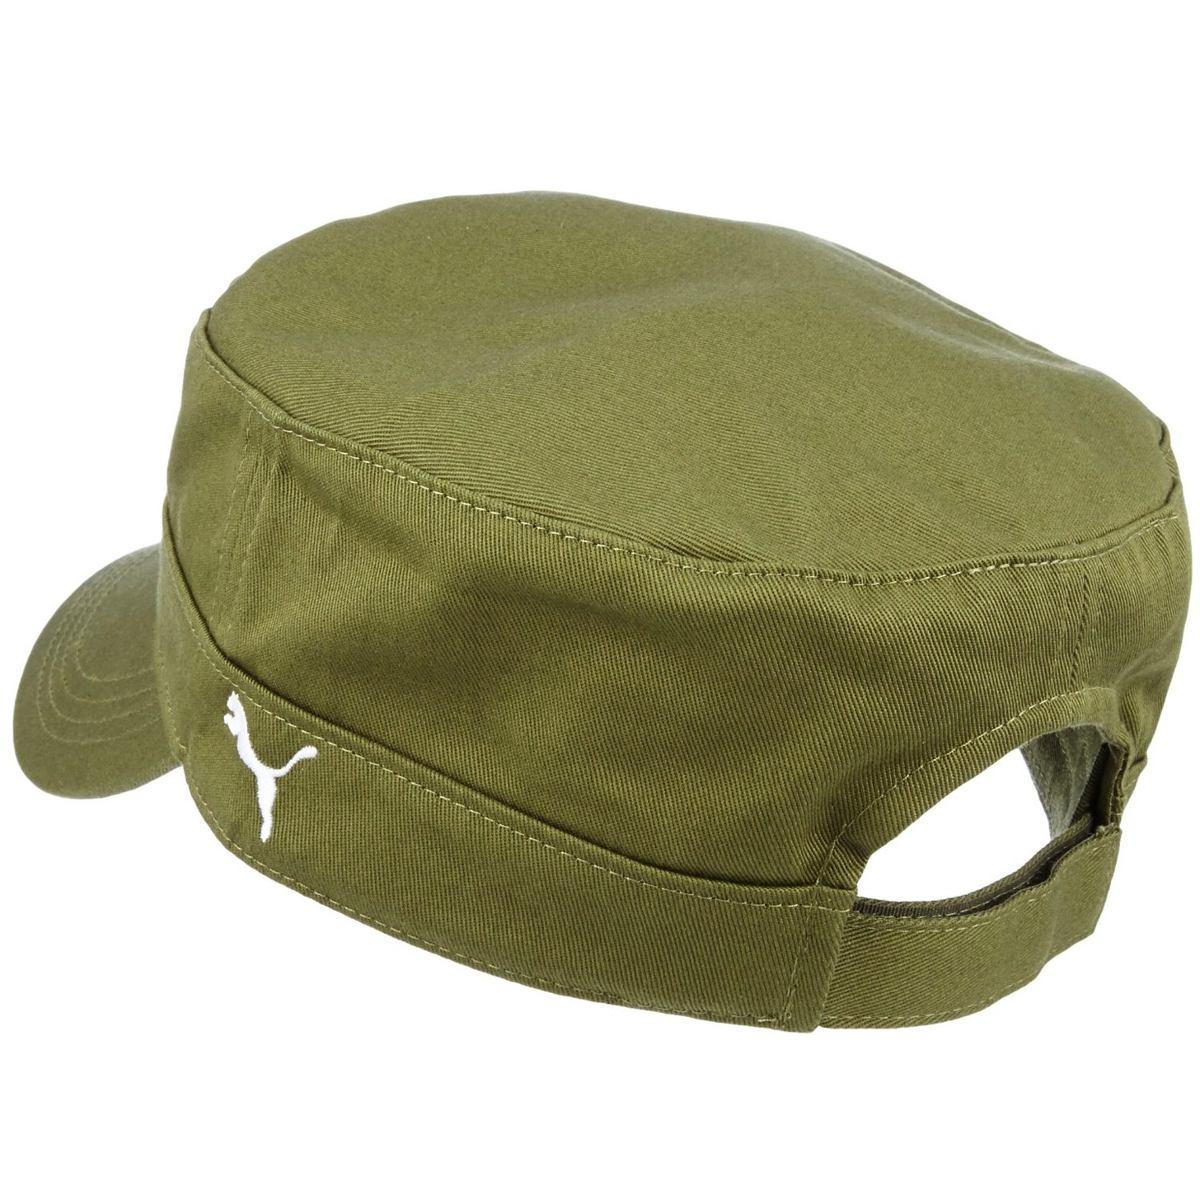 Gorra Militar Ess Military Ajustable 03 Puma 052923 -   179.00 en ... 41713261519